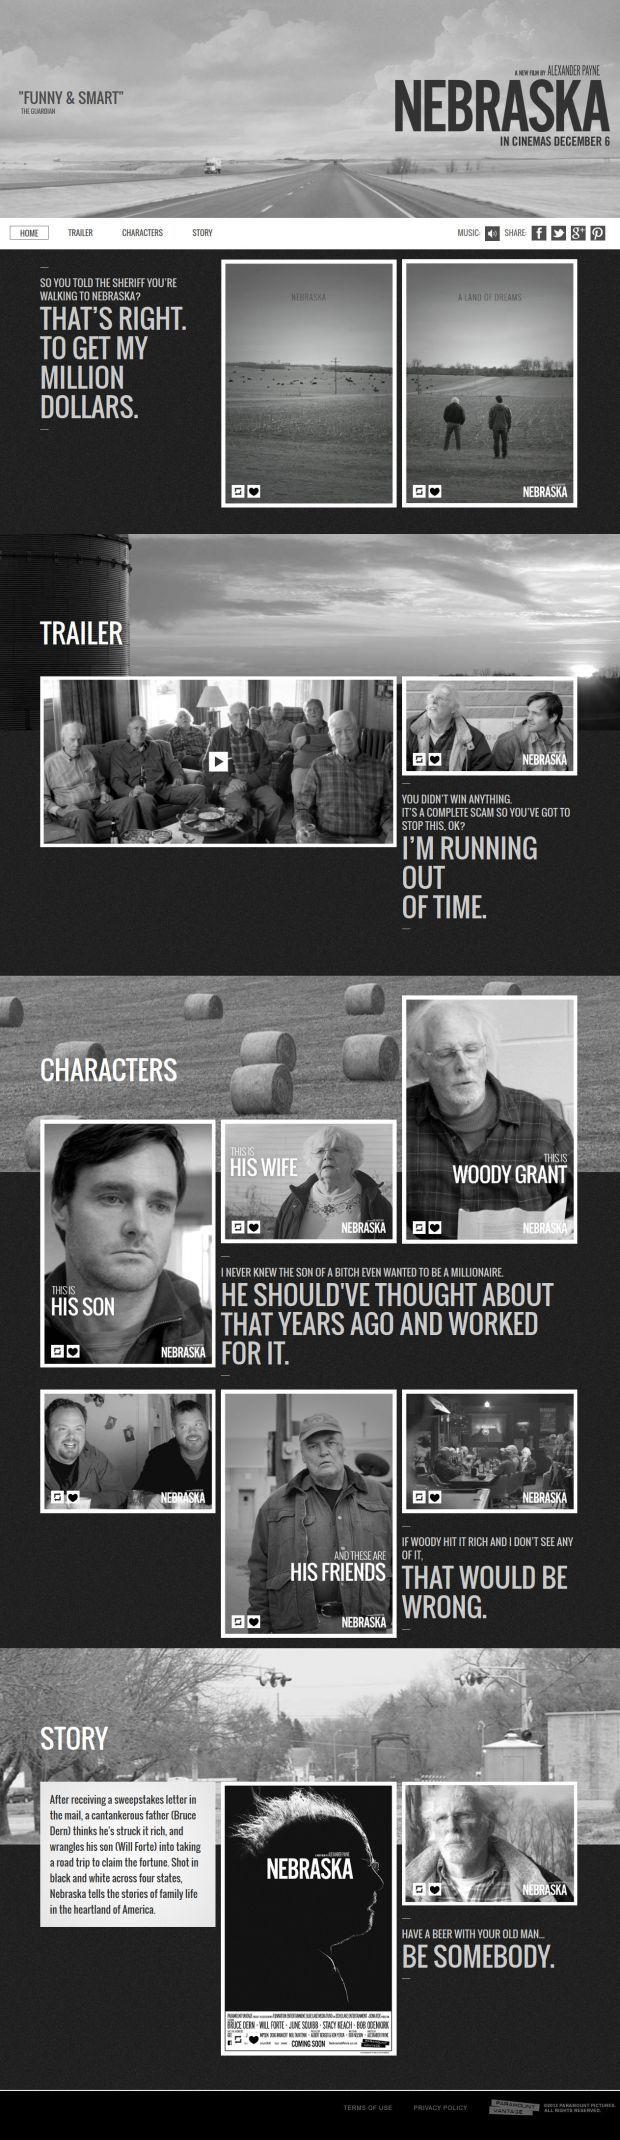 Nebraska Tumblr - html5, Responsive Design, jQuery, Inspiration, Scrolling Site, Film, Cinema, Website